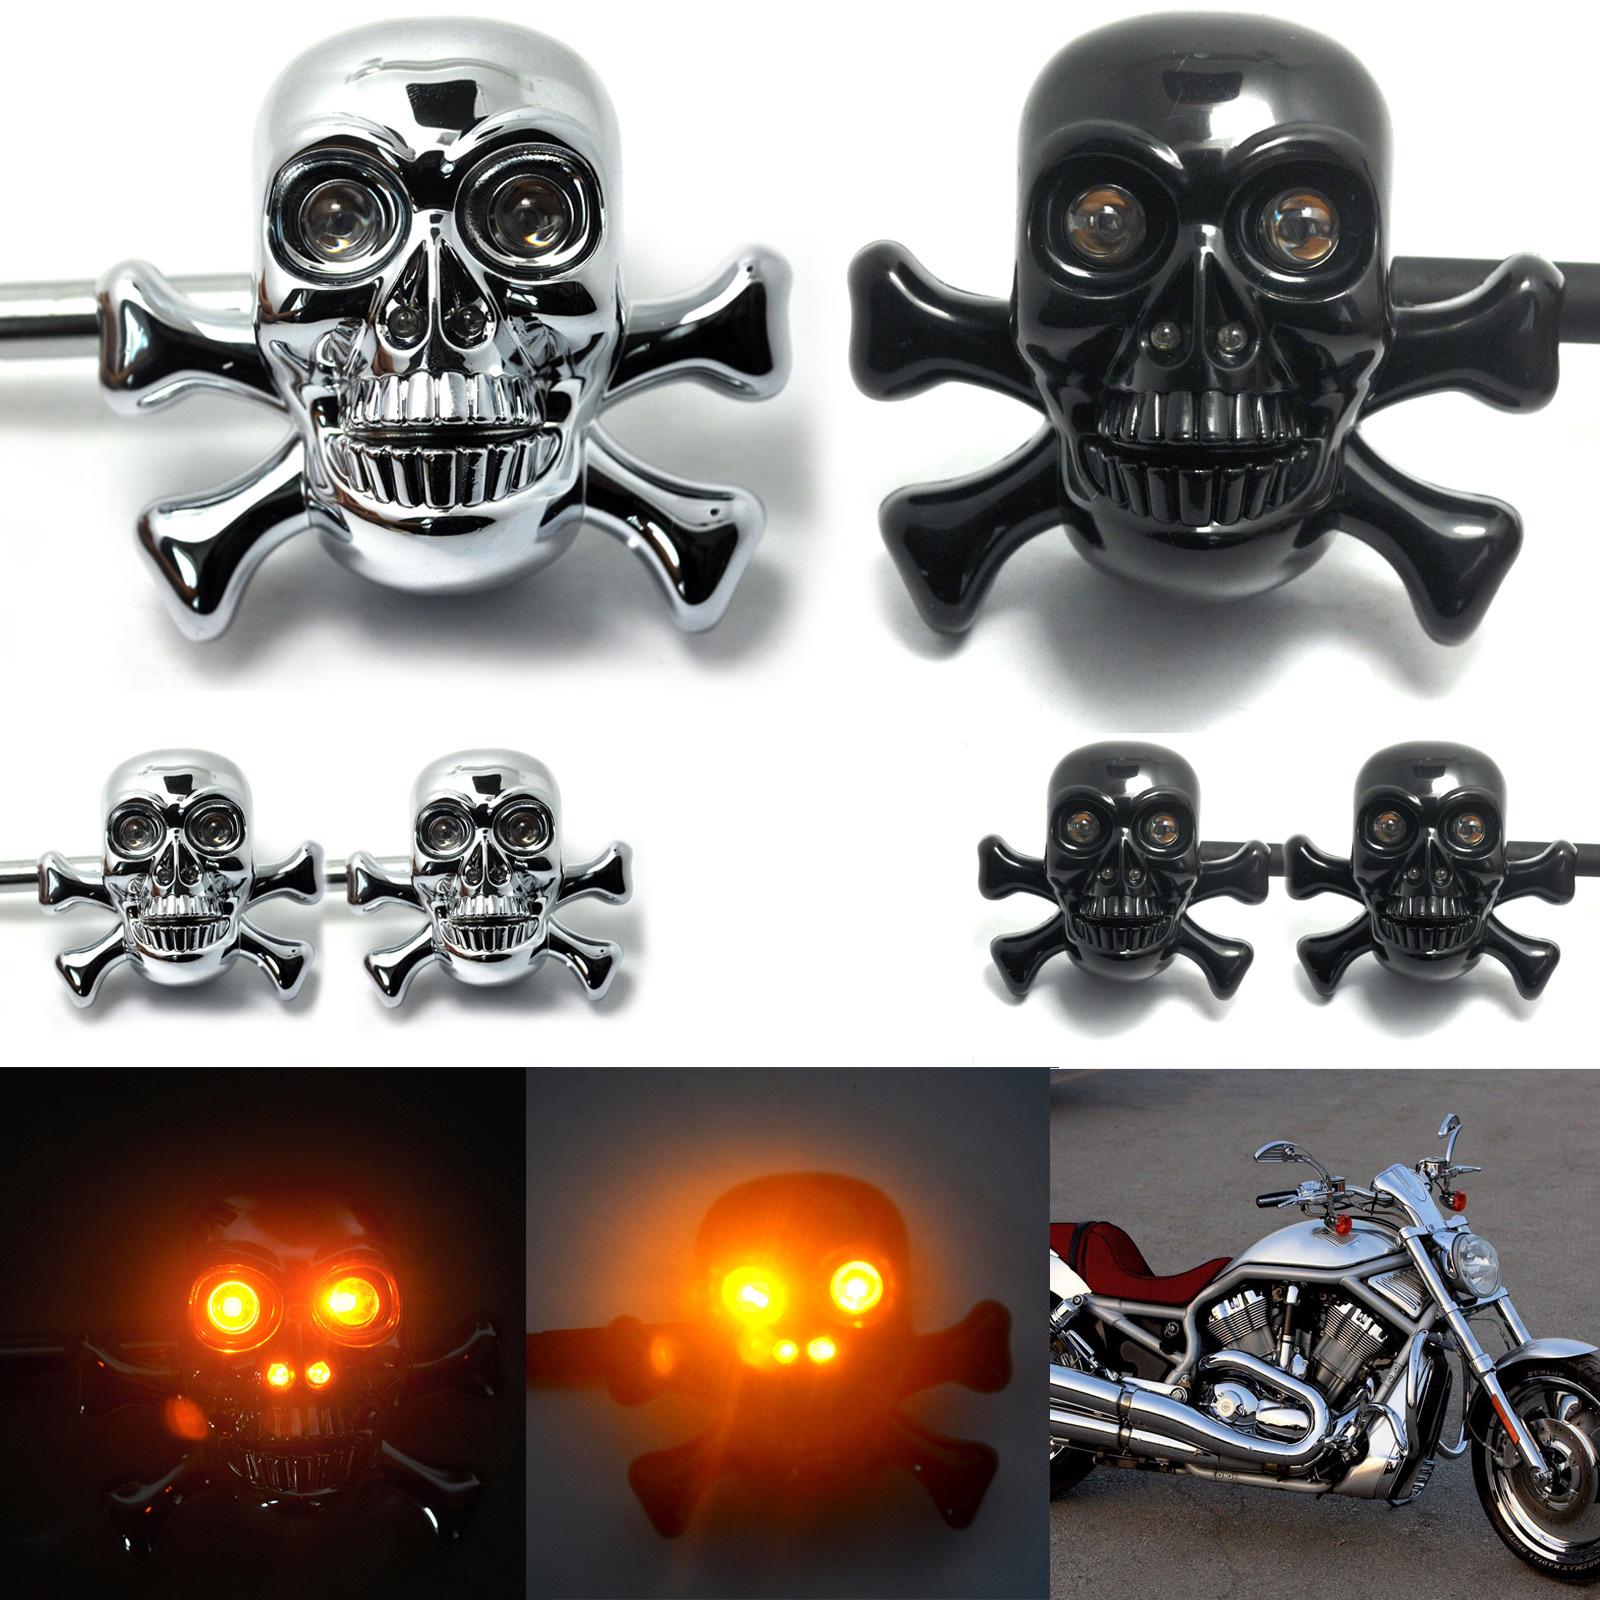 2pcs Universal Motorcycle Front&Rear LED Black Custom Skull Turn Signal Light Fits For Harley Crusier Chopper Moto(China (Mainland))